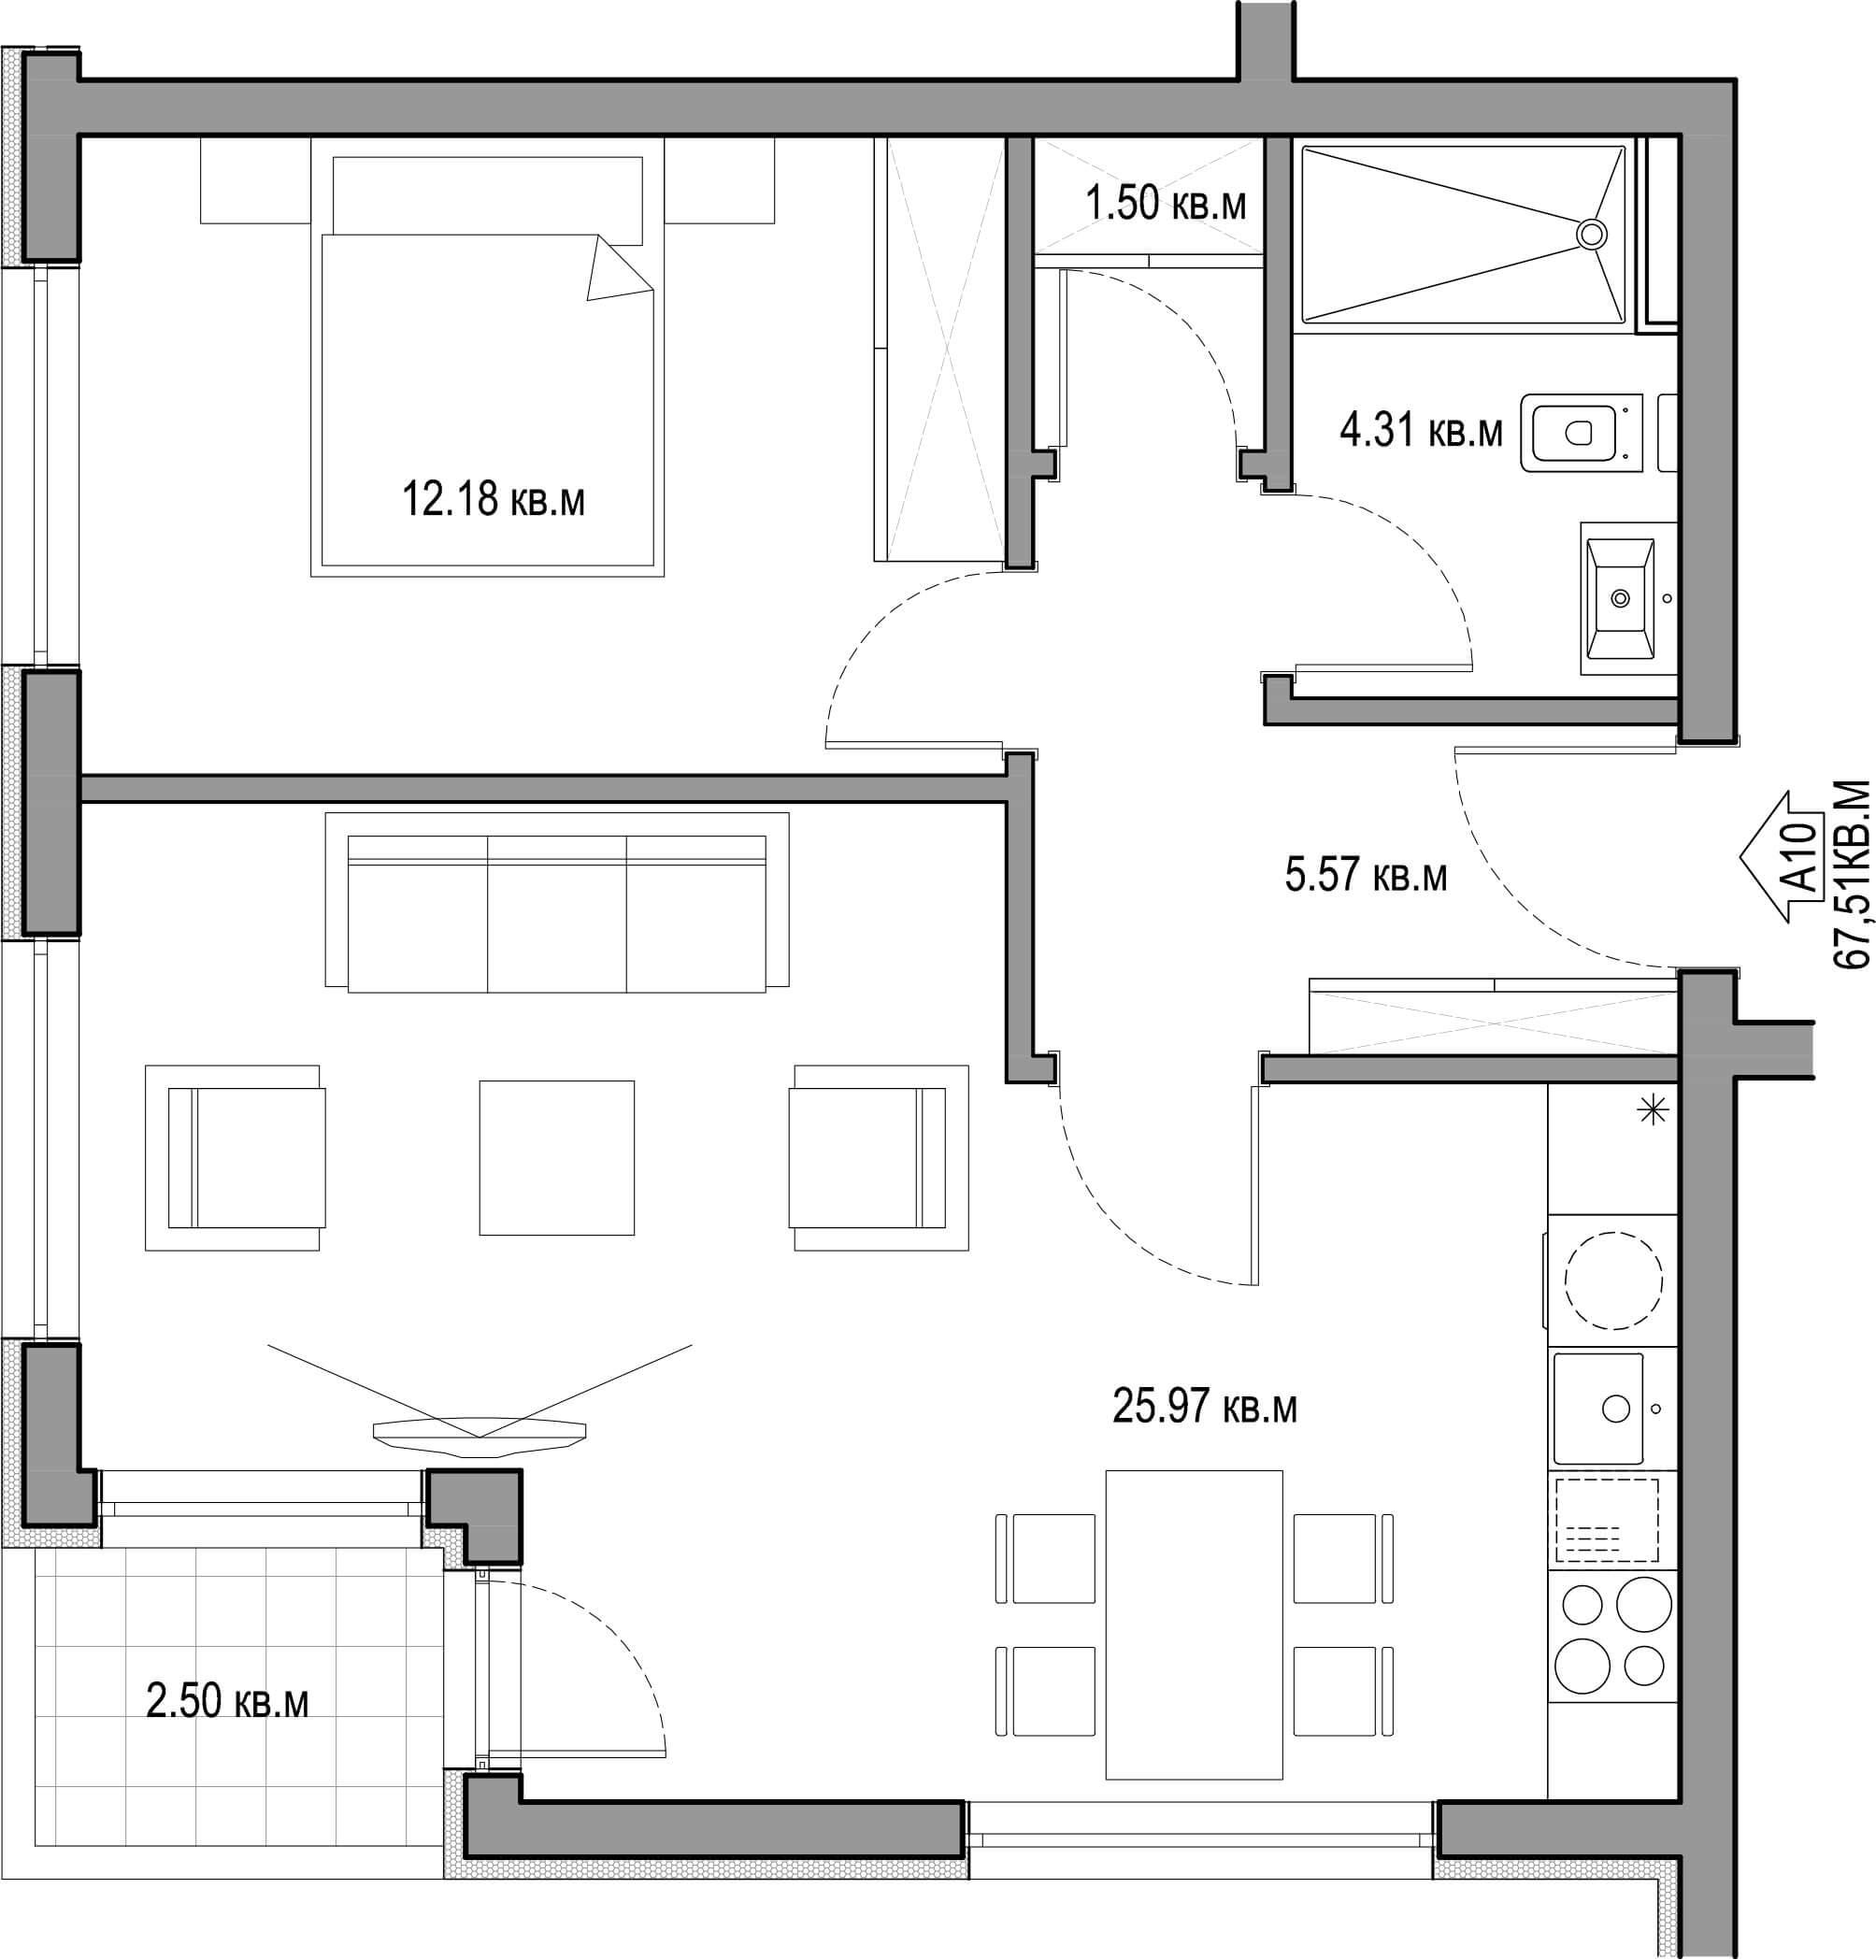 Vinitsa_Apartment_1_10